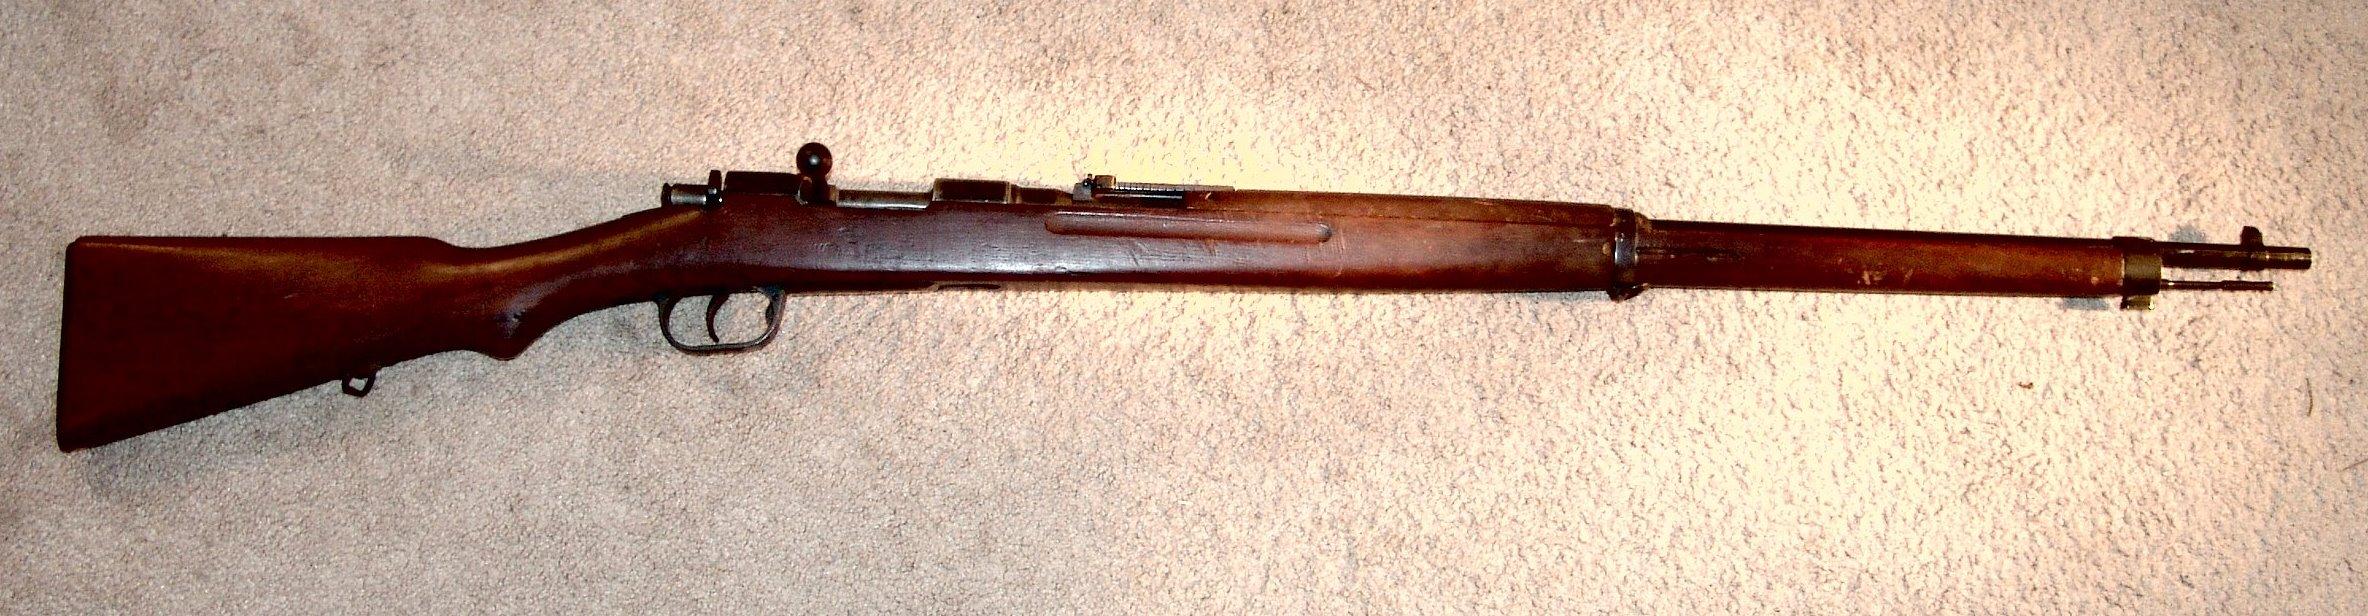 TypeI Rifle